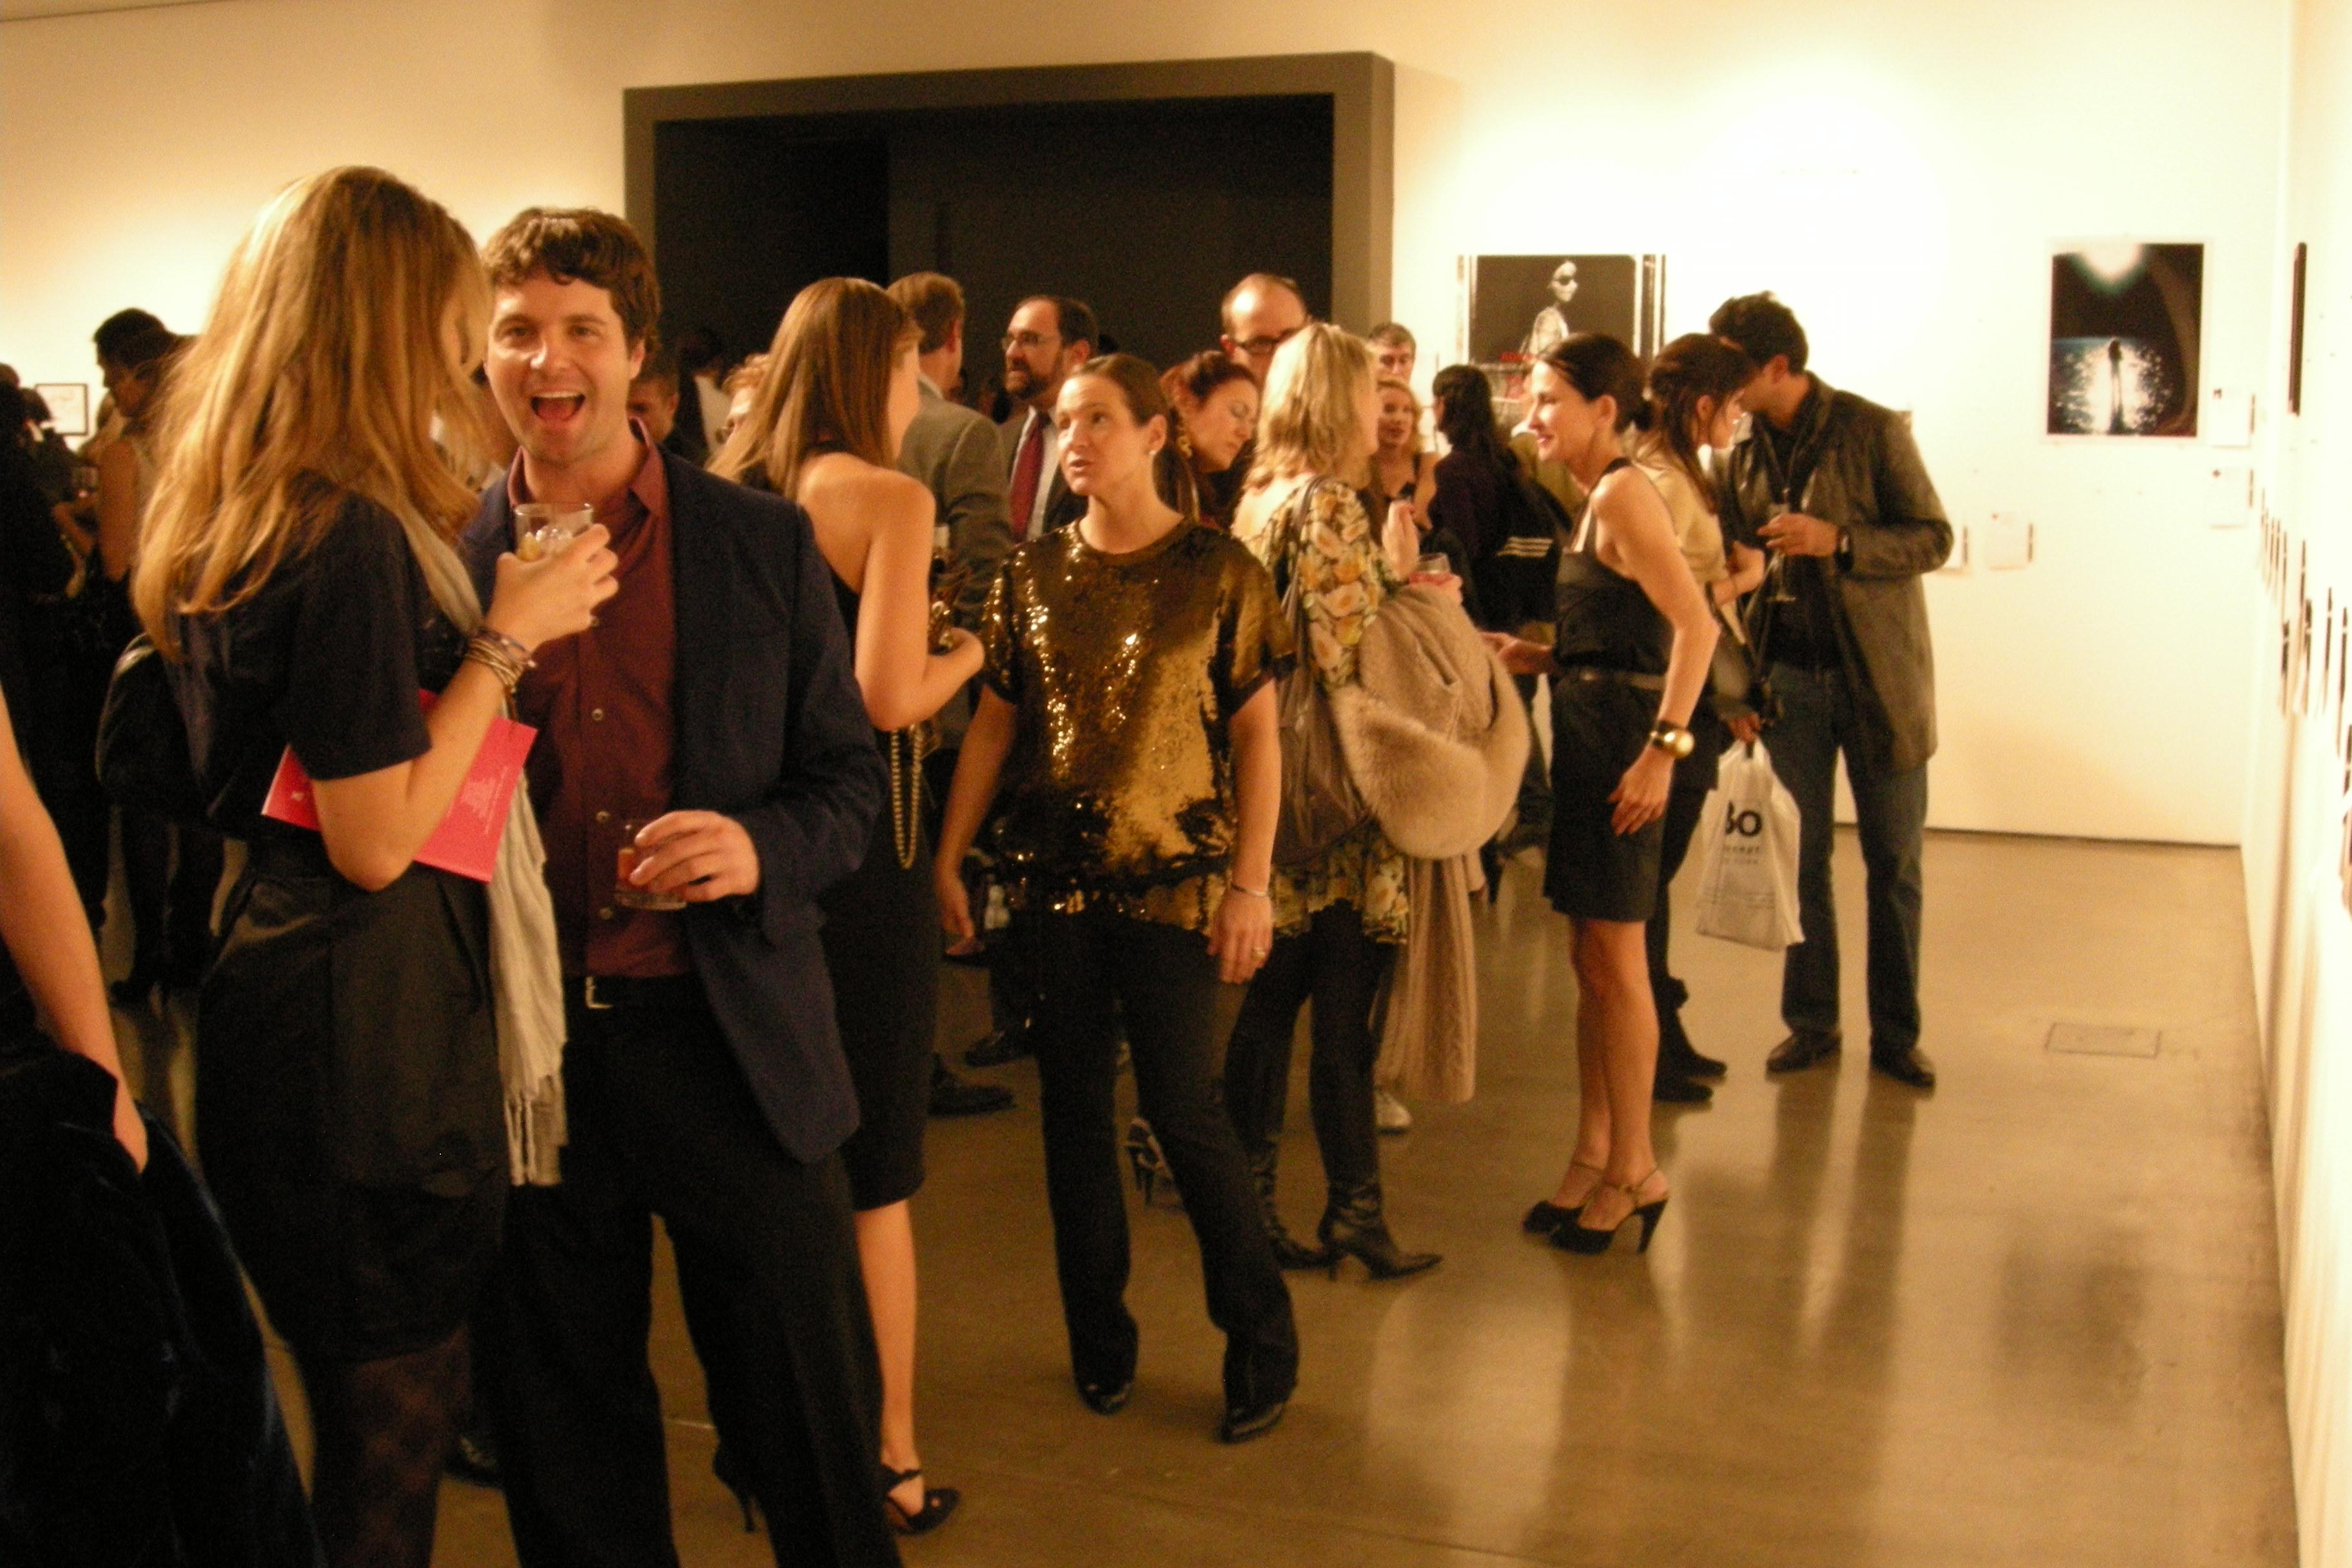 » AO ON SITE: RxArt- The Party 2008, Thursday, November